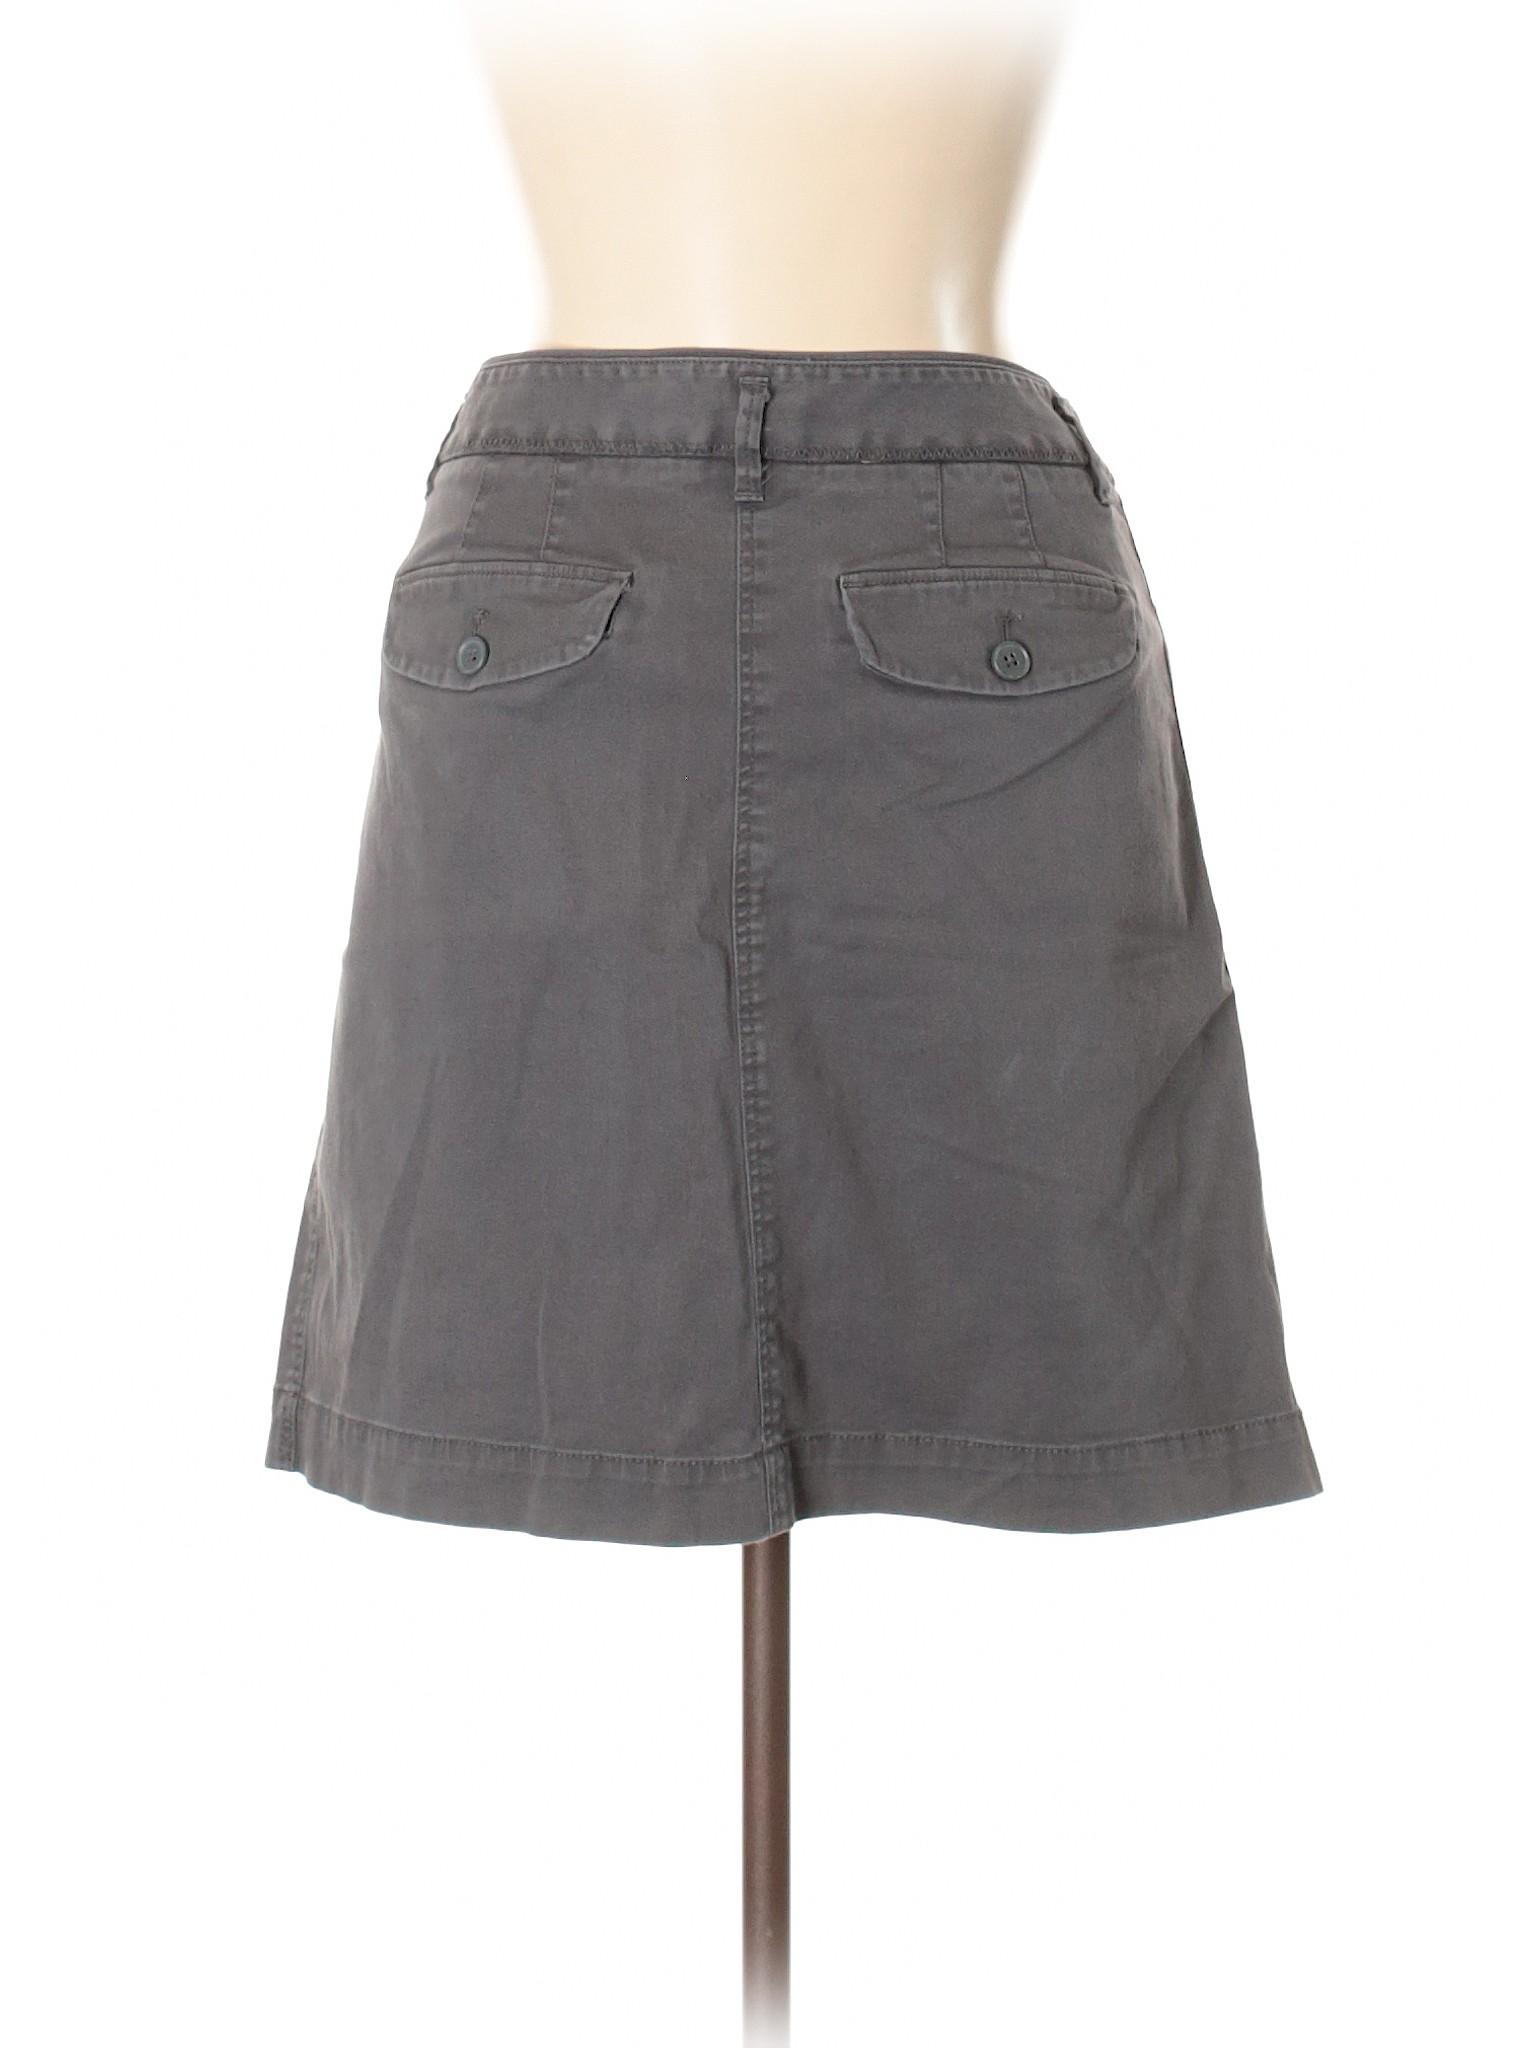 Boutique Casual Casual Casual Casual Casual Skirt Boutique Boutique Skirt Boutique Skirt Skirt Skirt Boutique Casual Boutique qPxgfwHU